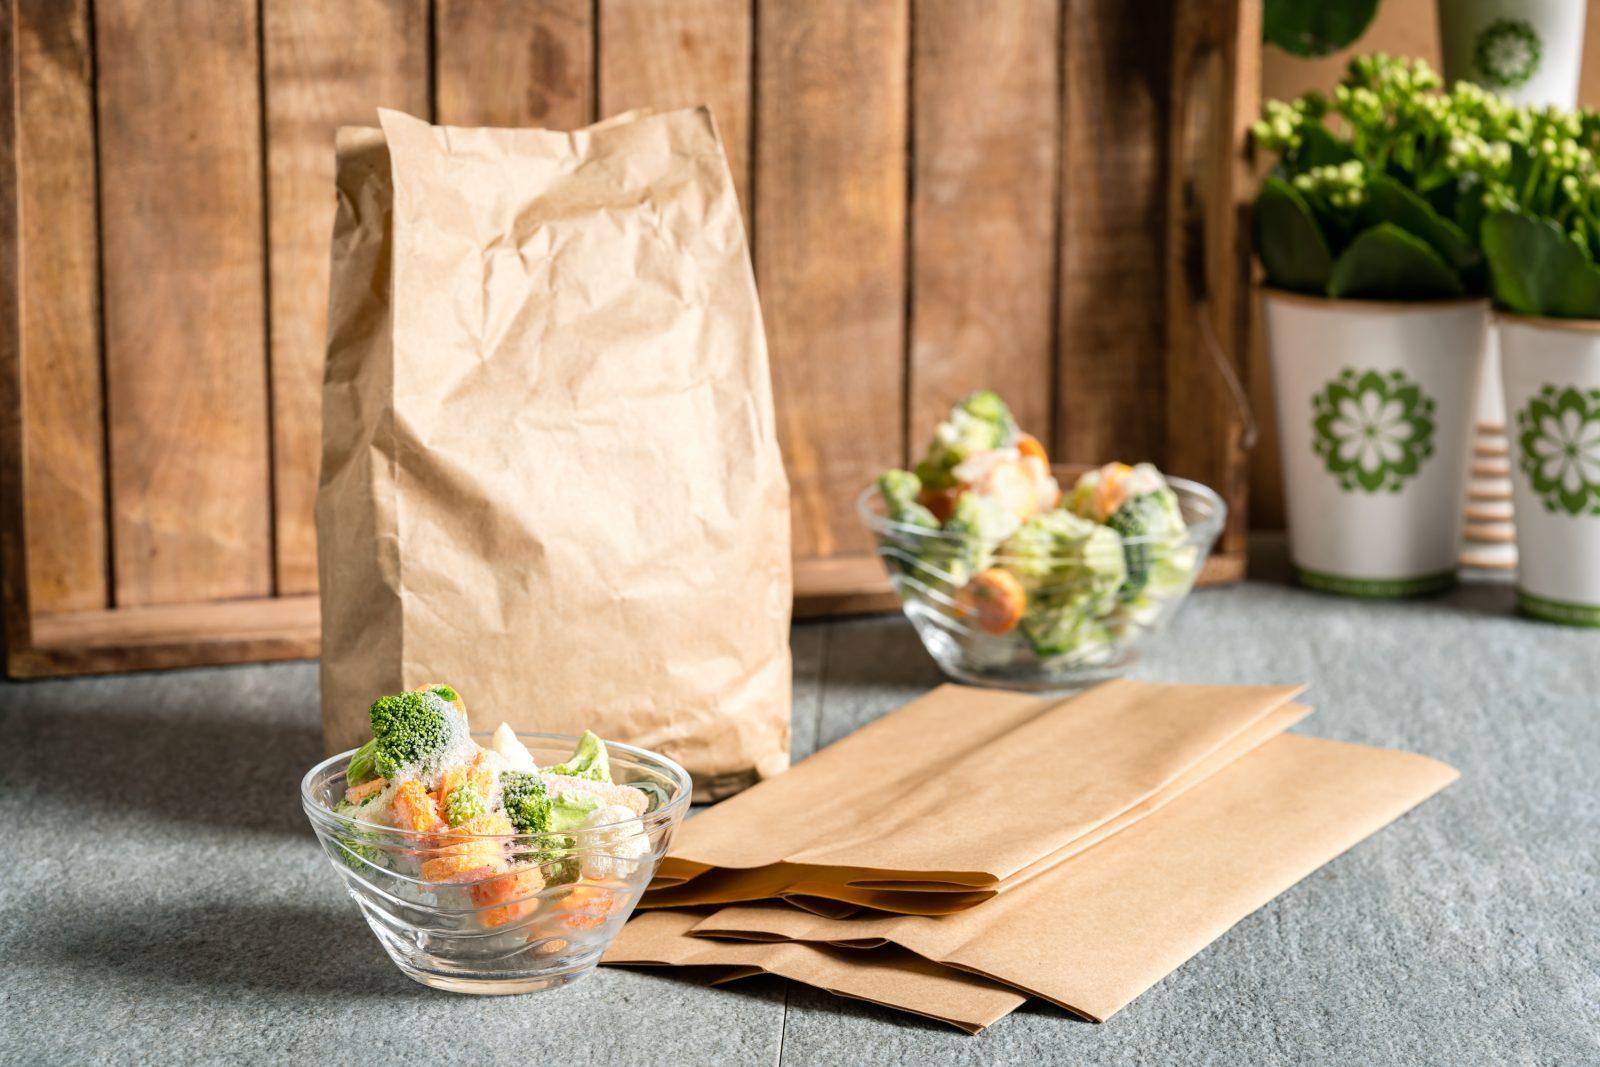 flexible packaging plastic-free